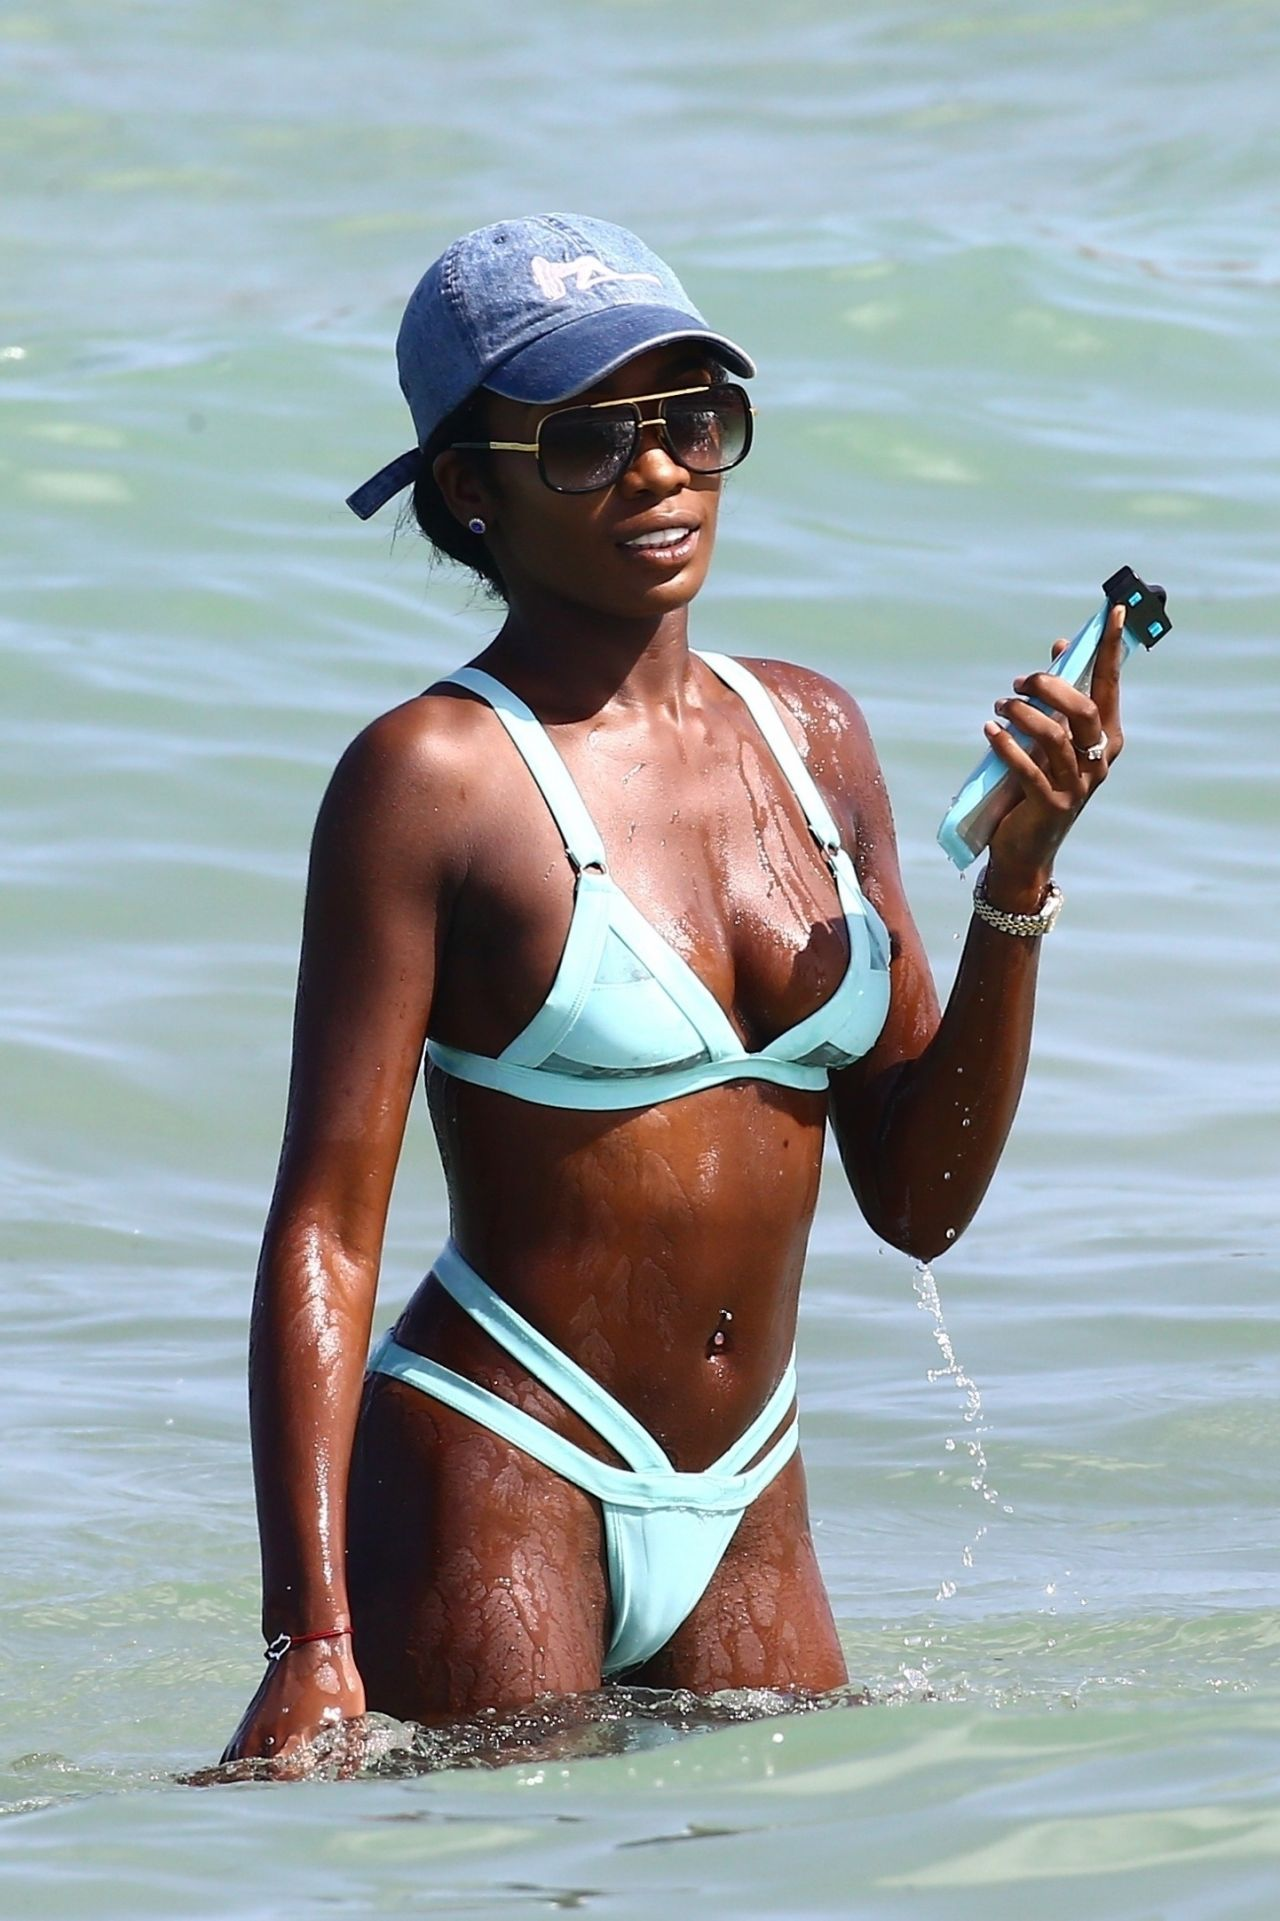 Ebony London In A Baby Blue Bikini And A Denim Cap Miami